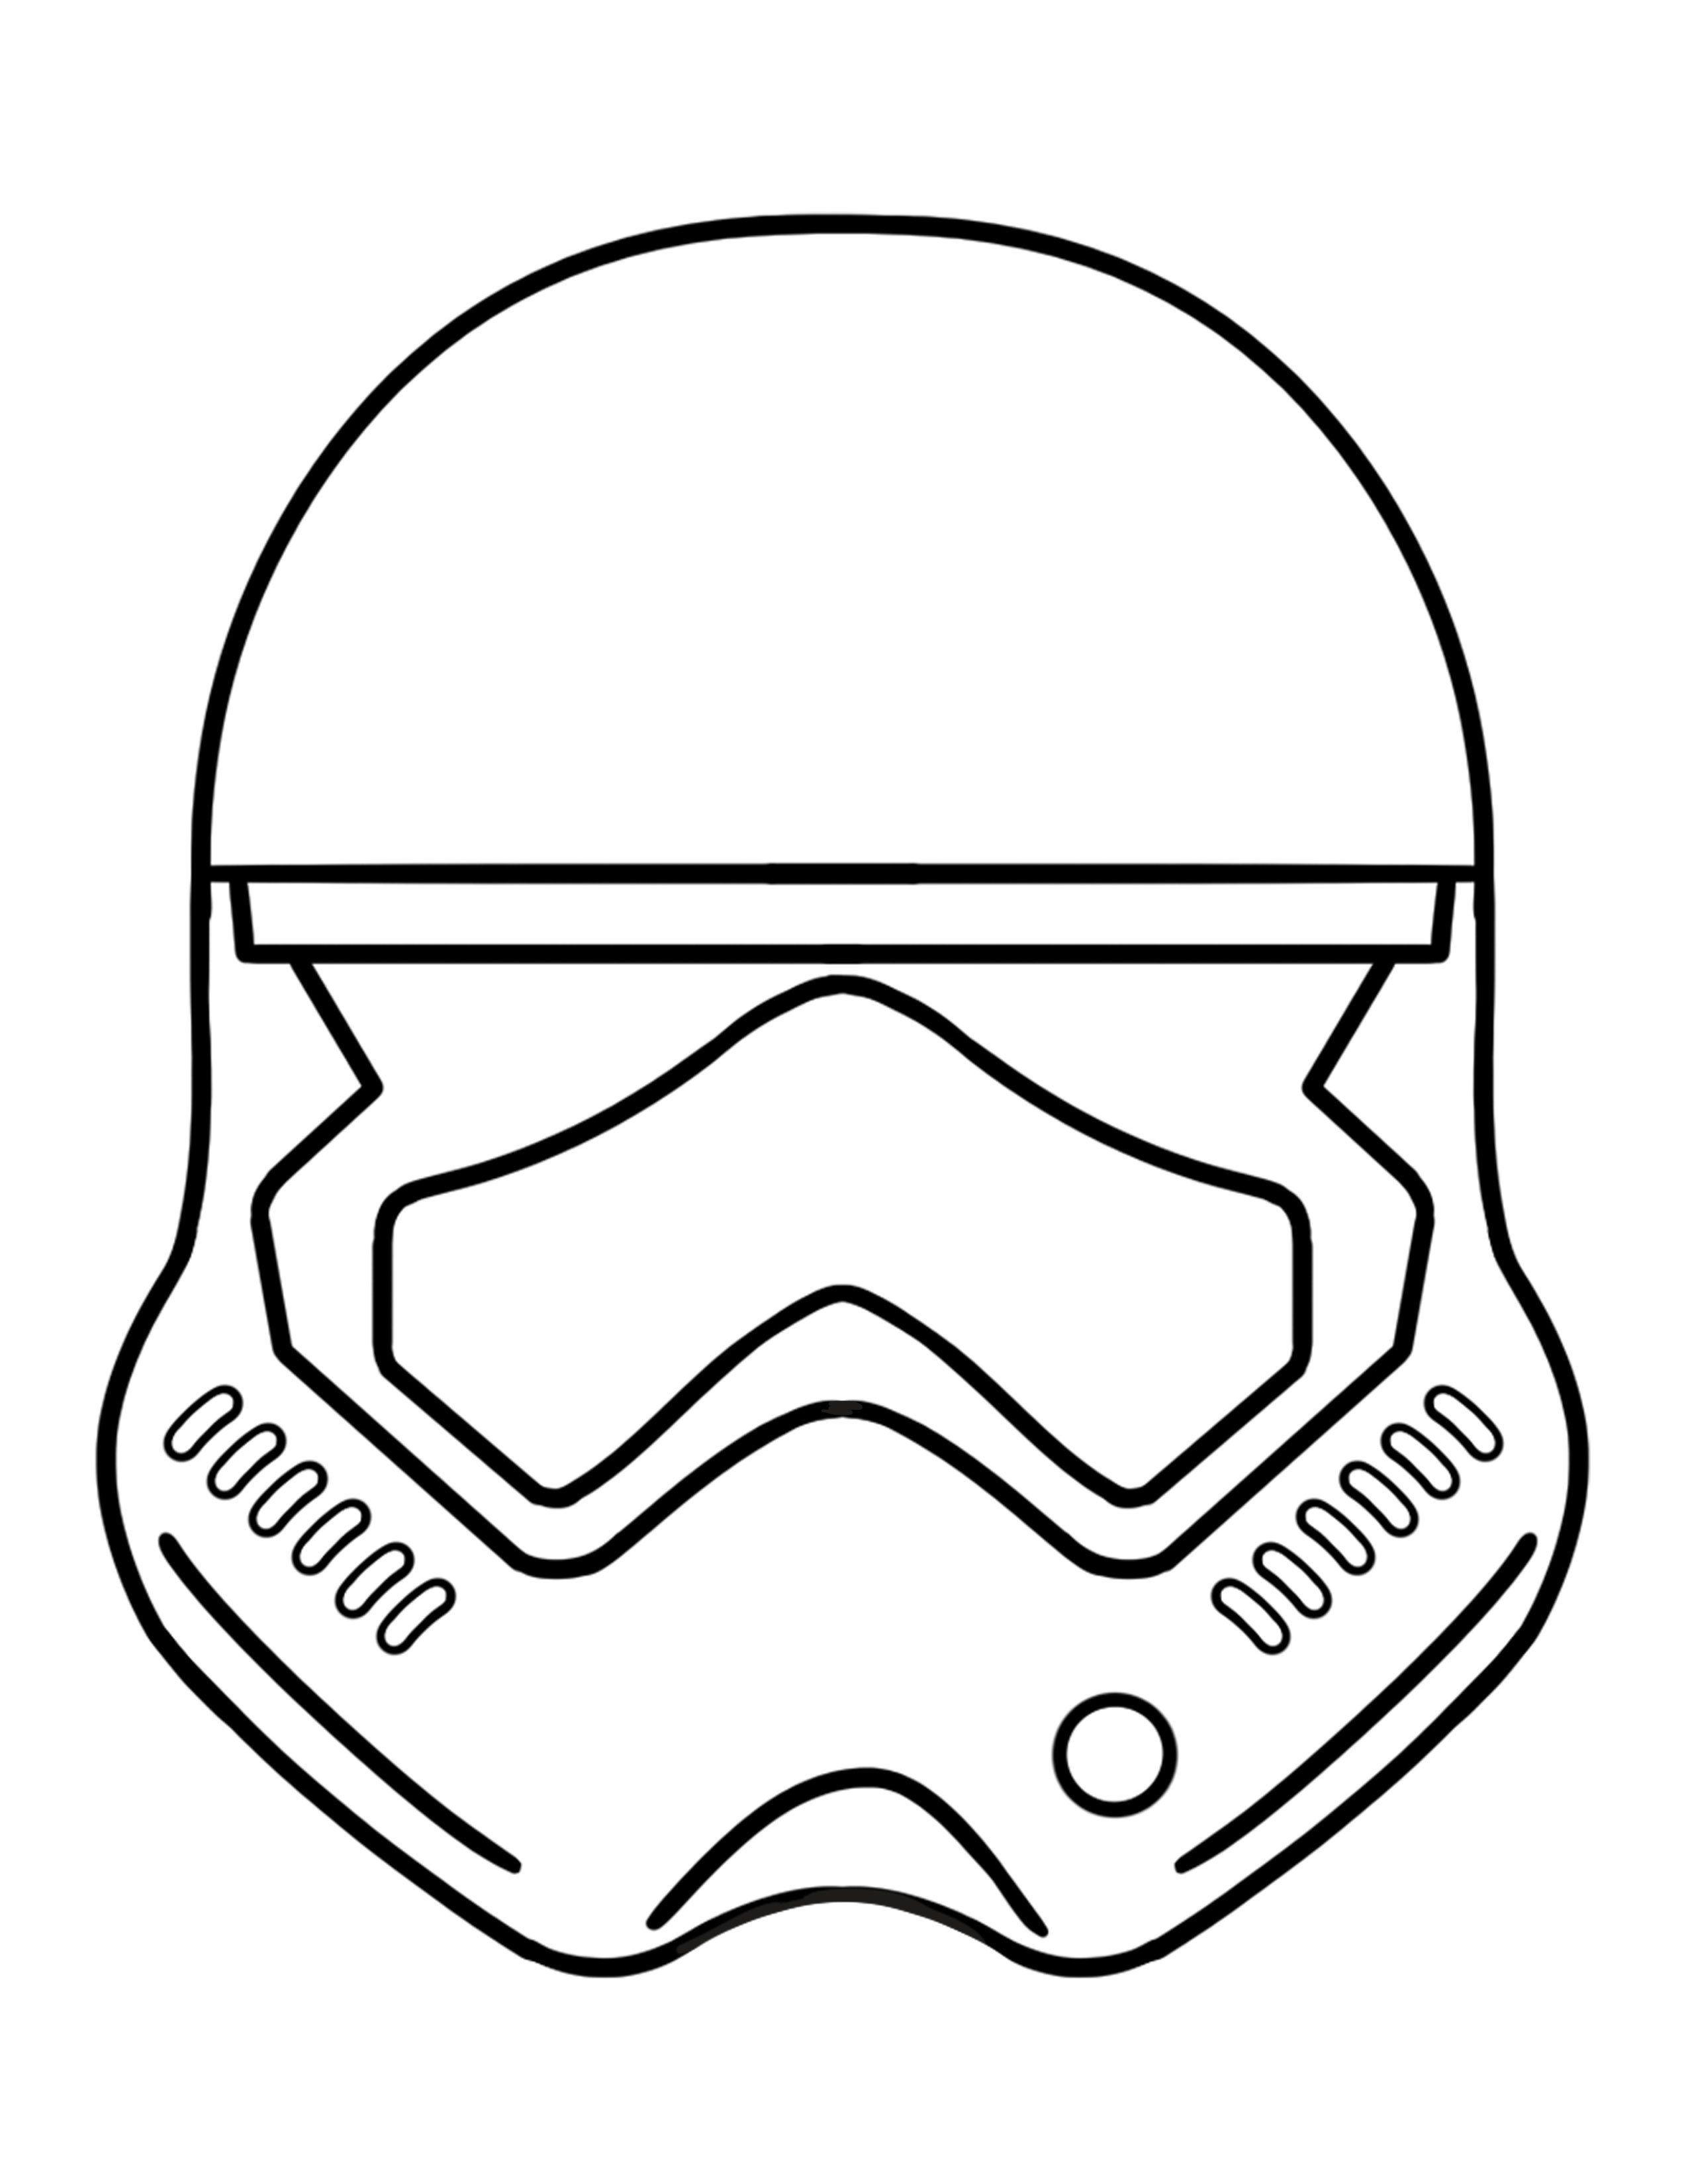 Image result for cool star wars stormtroopers helmet